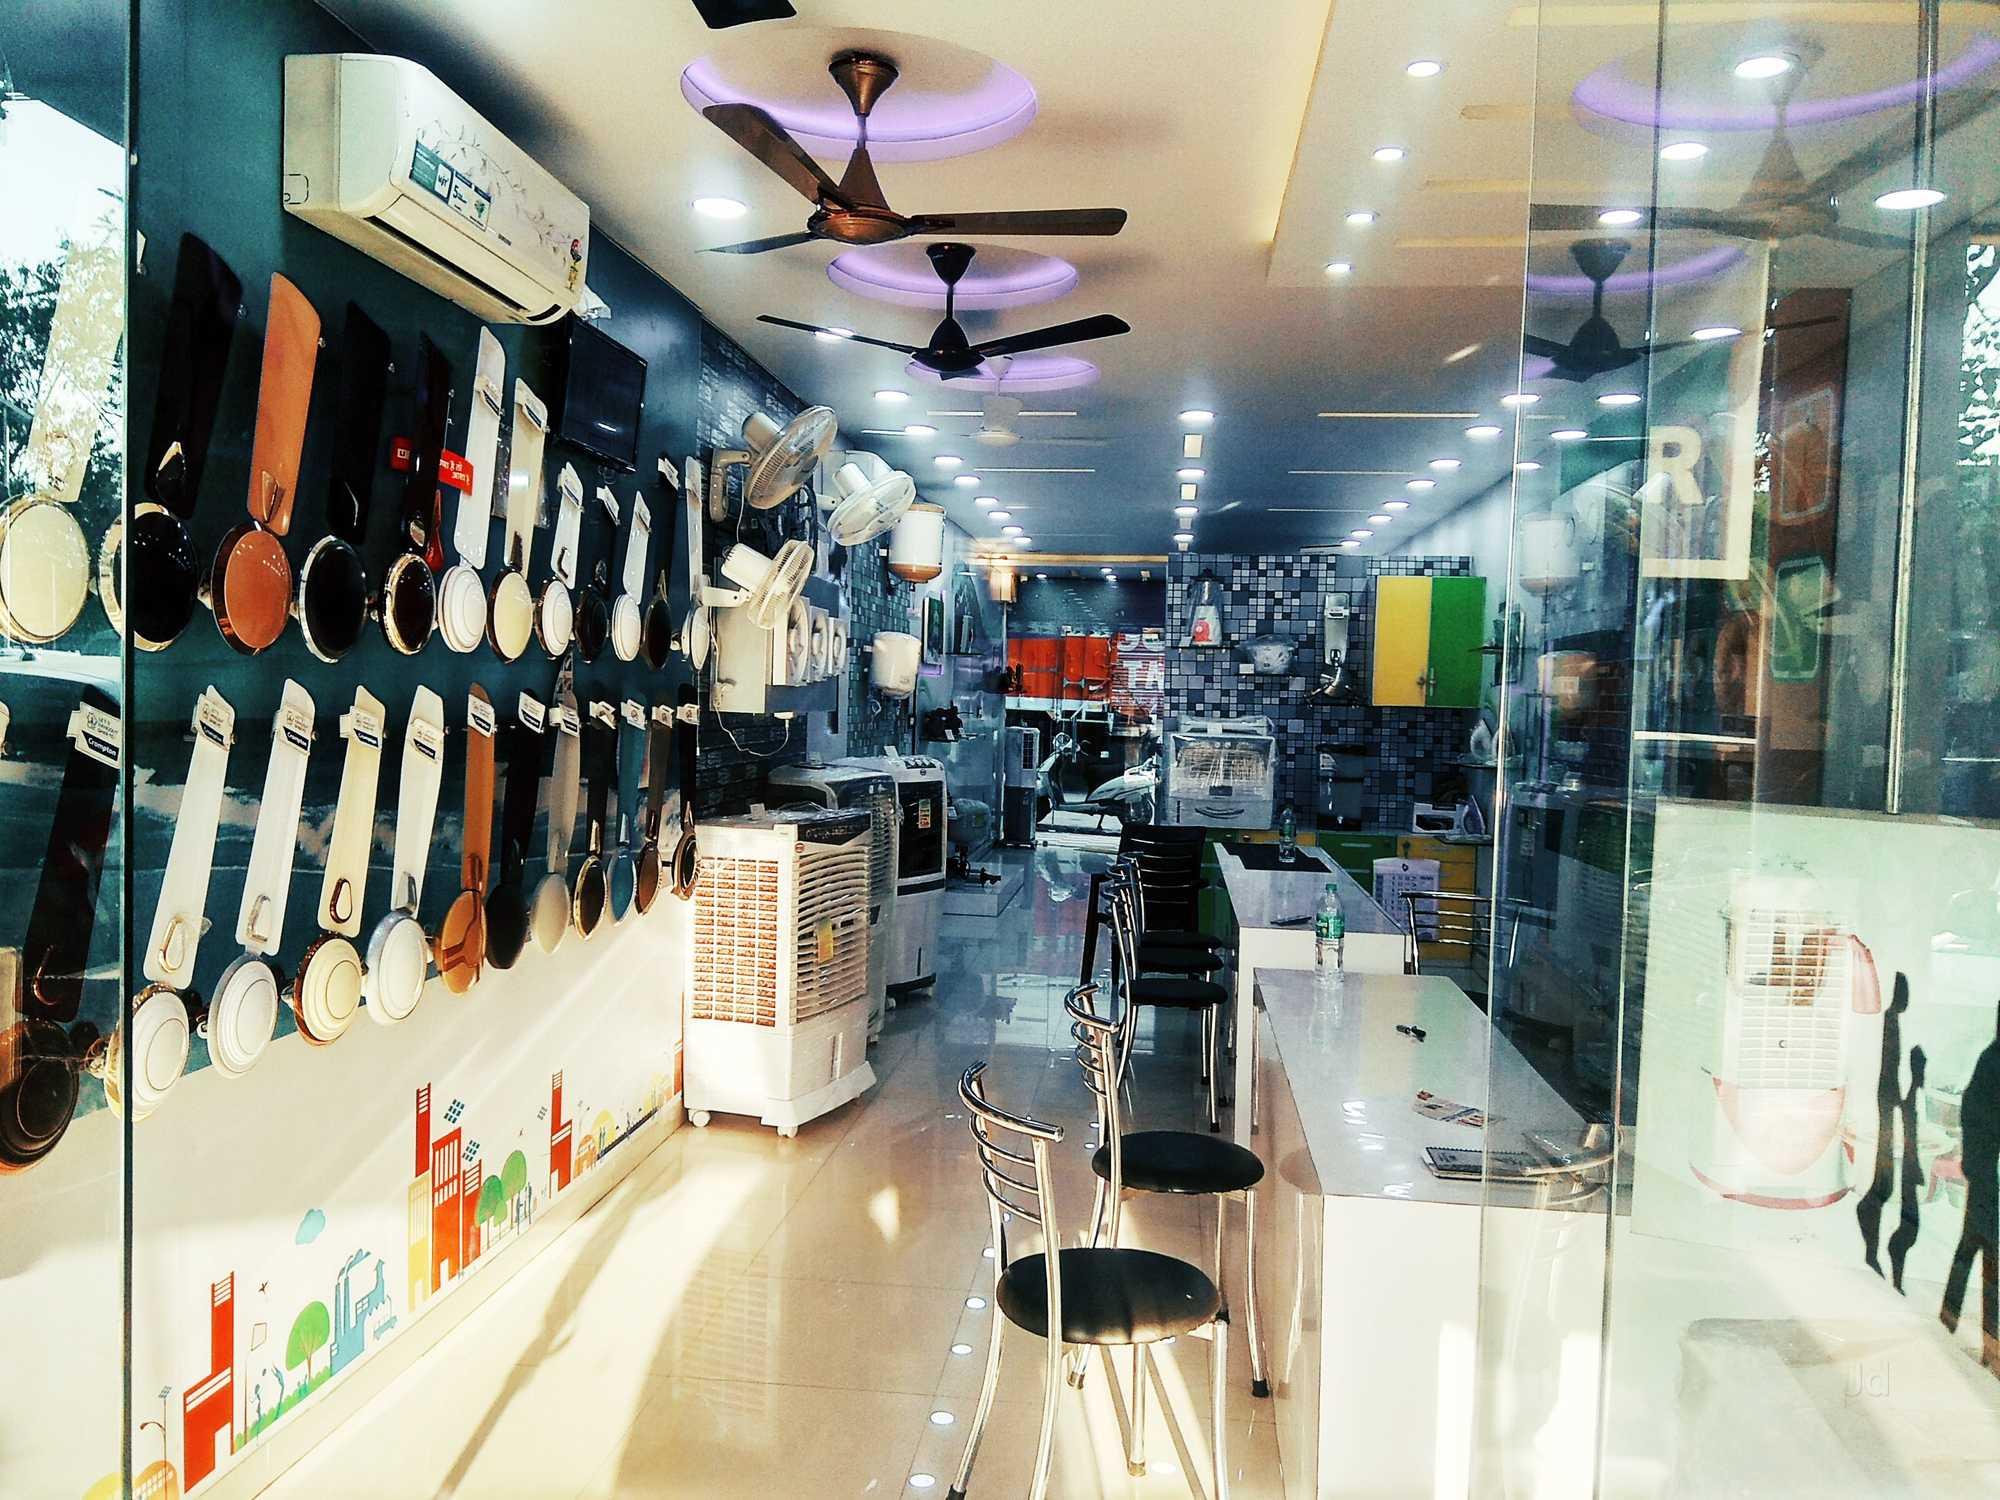 Usha set to woo consumers this festive season